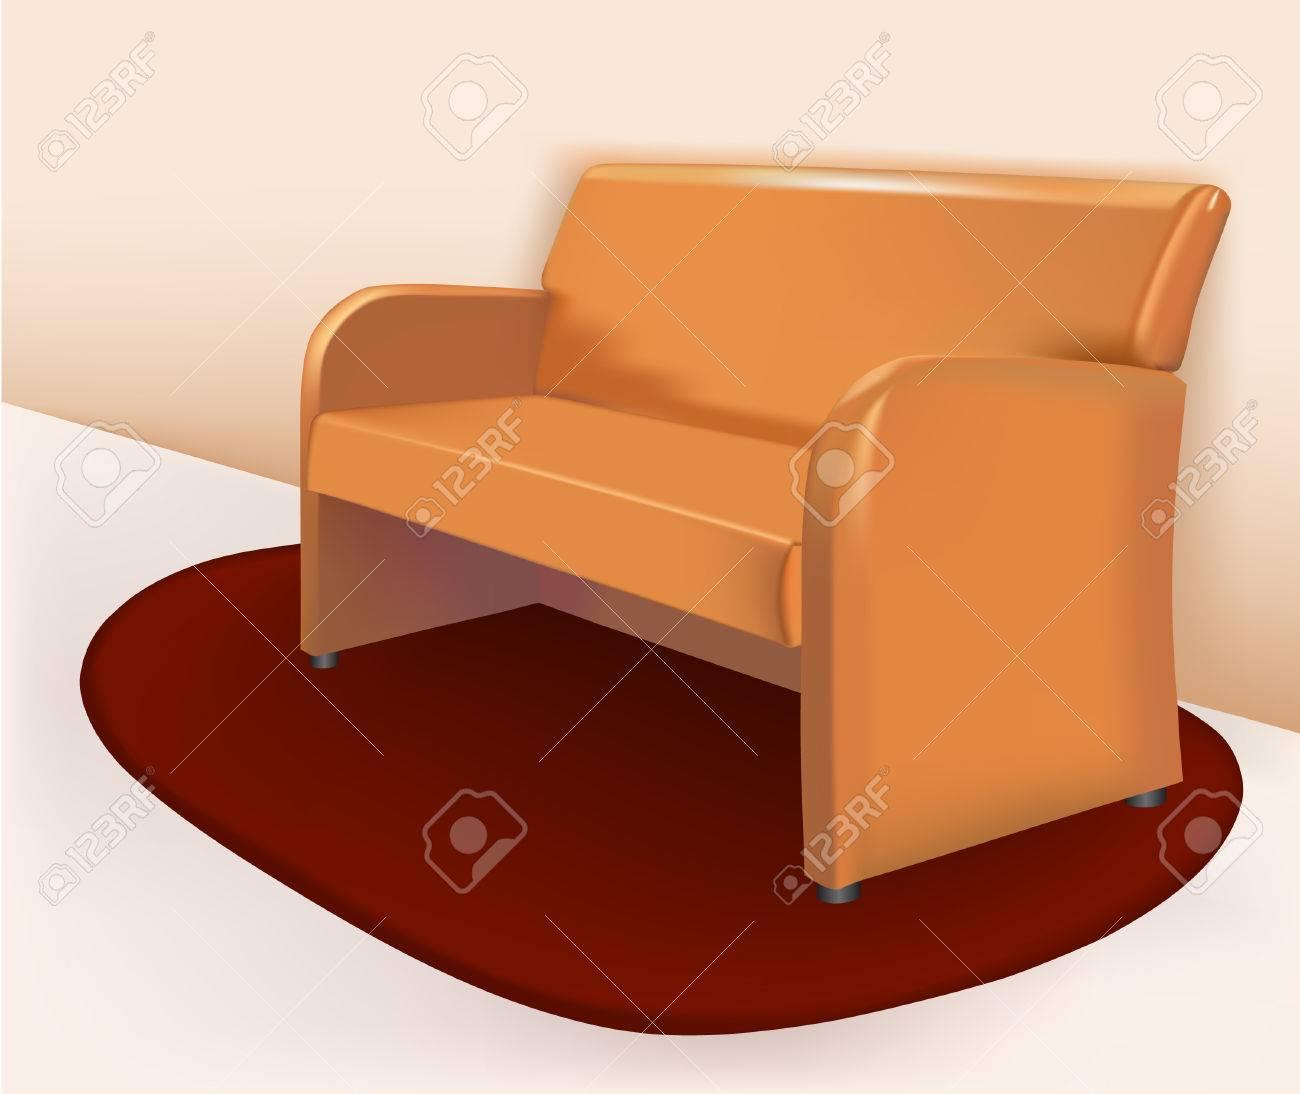 Bordeauxrode Leren Bank.Soft Brown Leather Sofa Is On The Burgundy Carpet